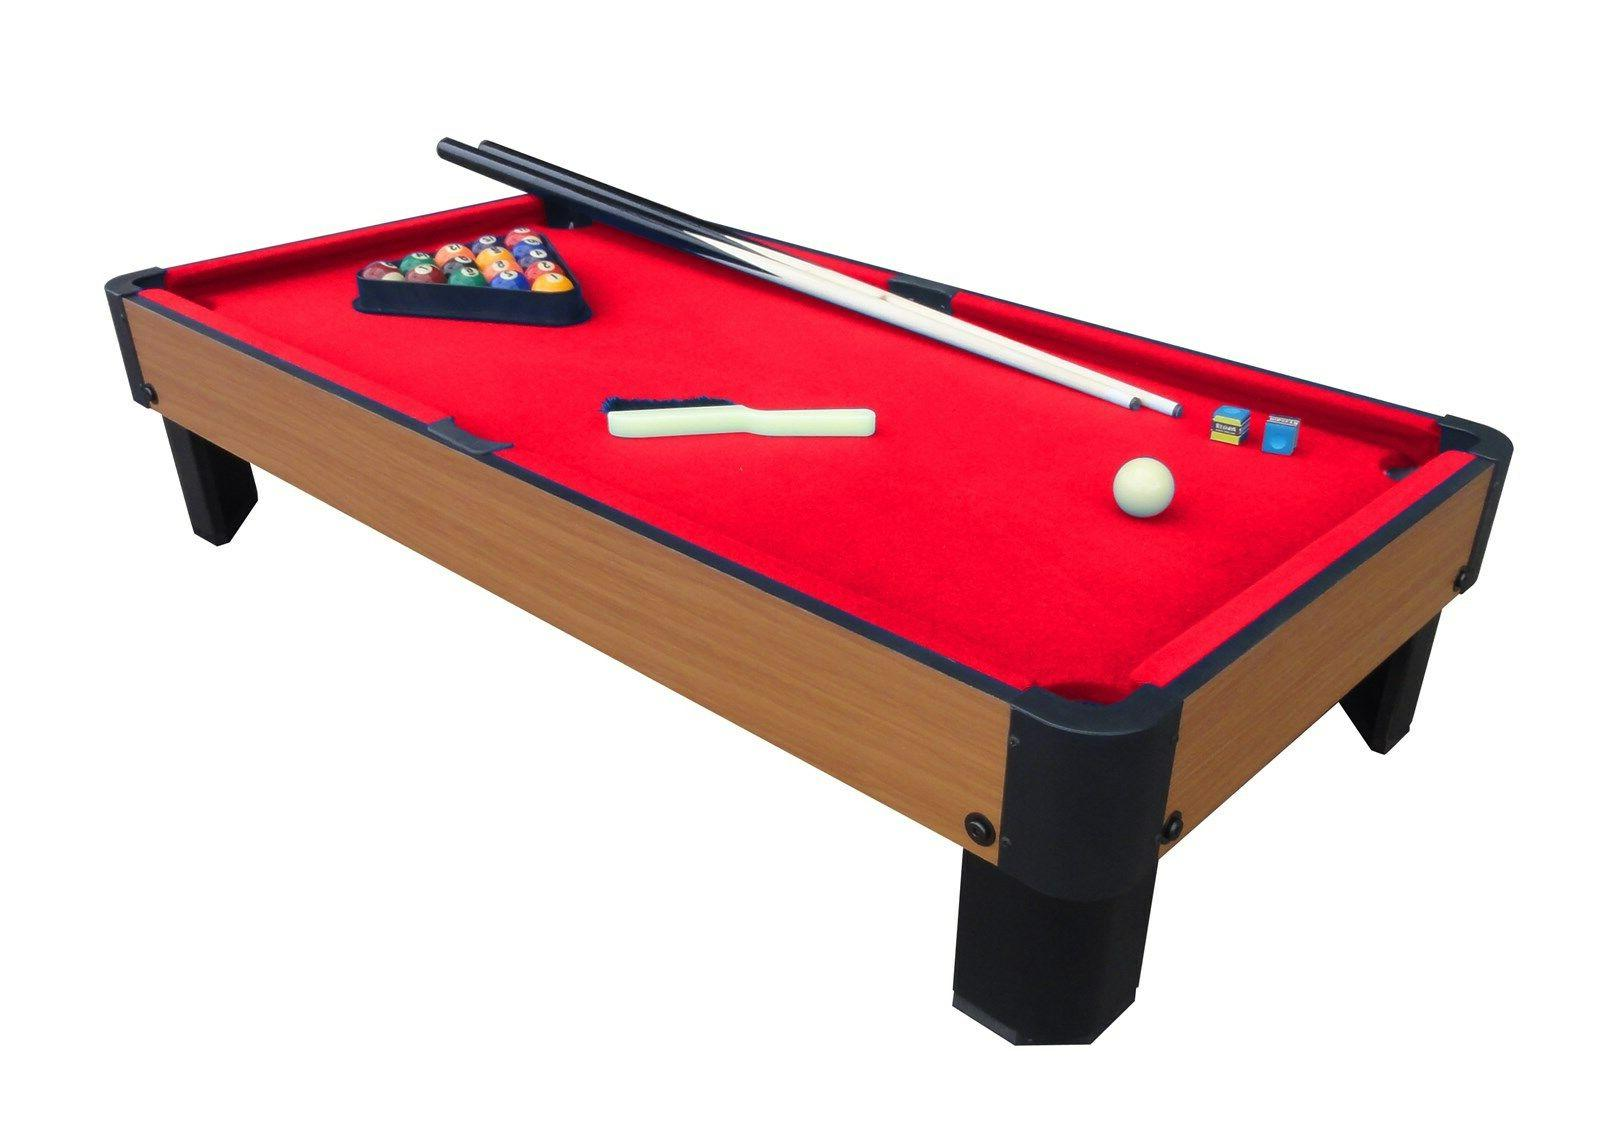 bank shot 40 pool table red cloth